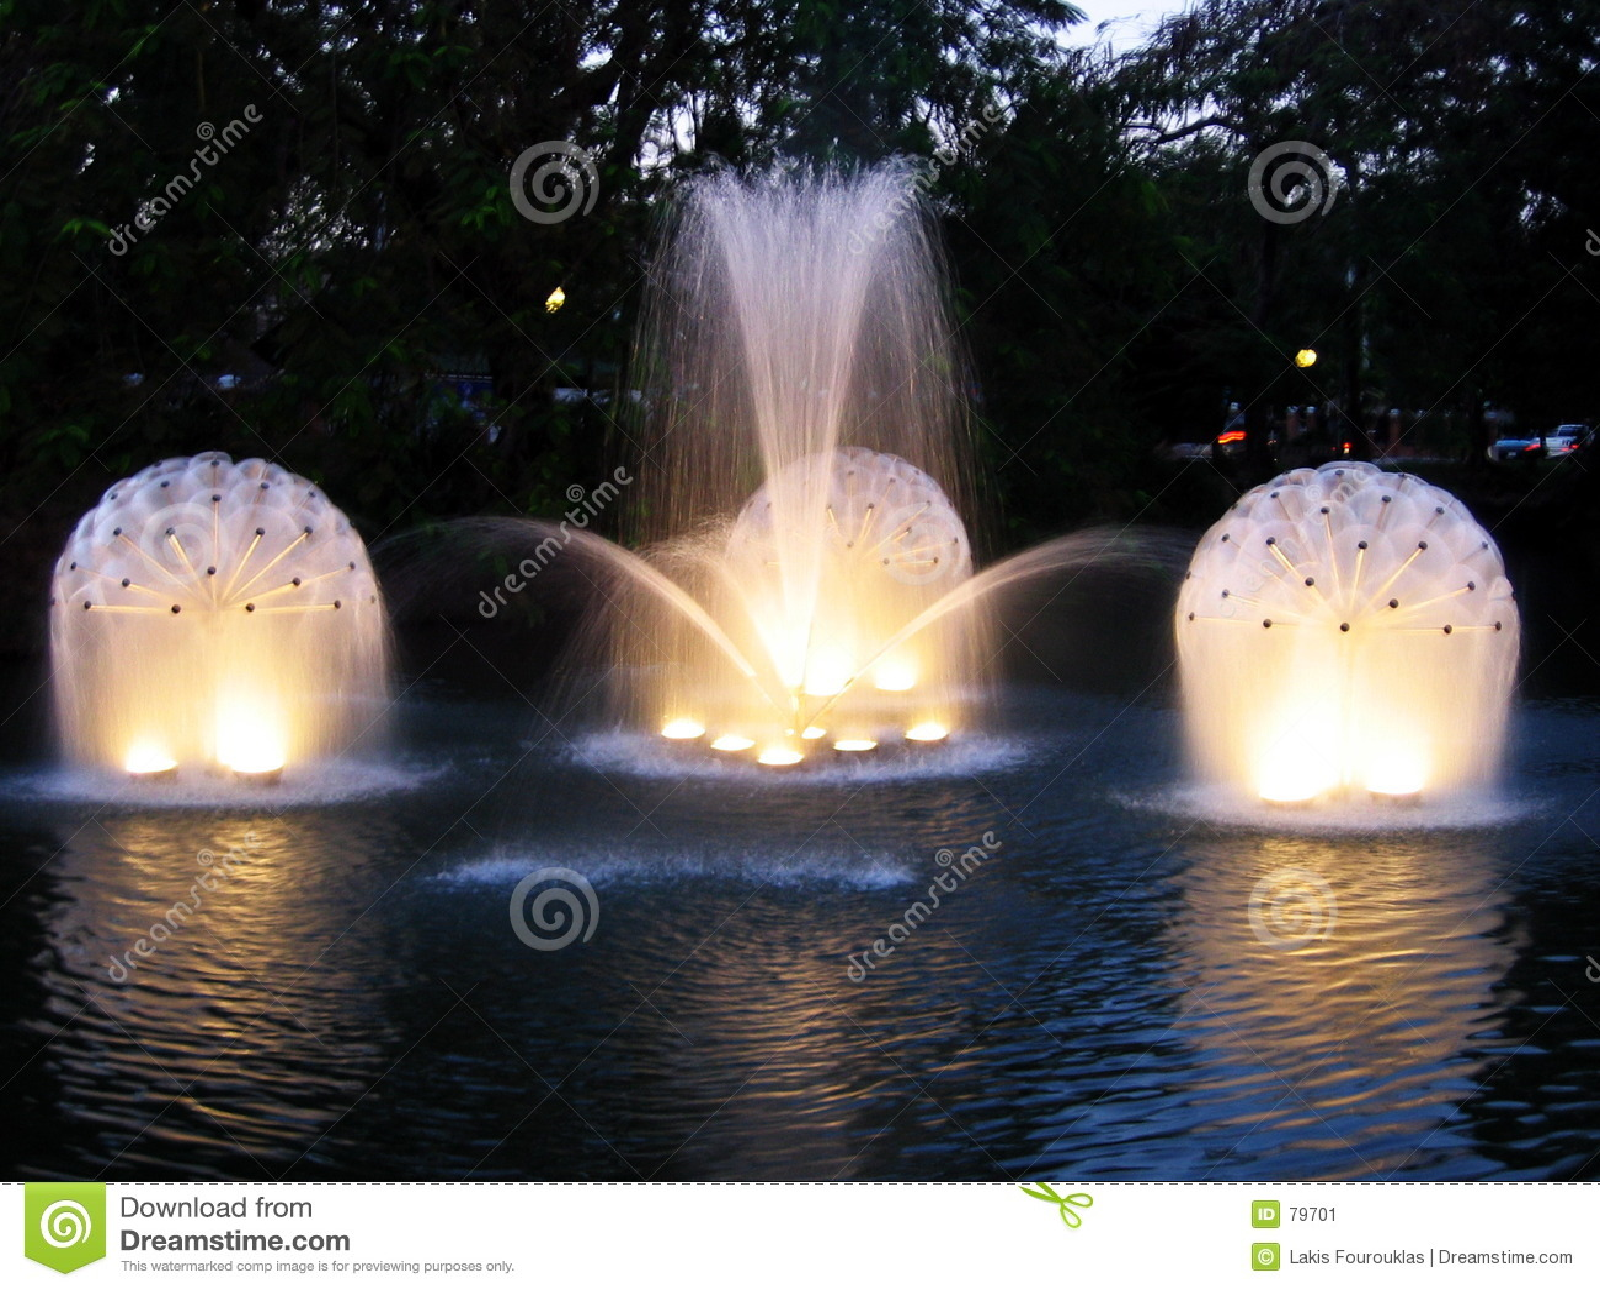 Lights water